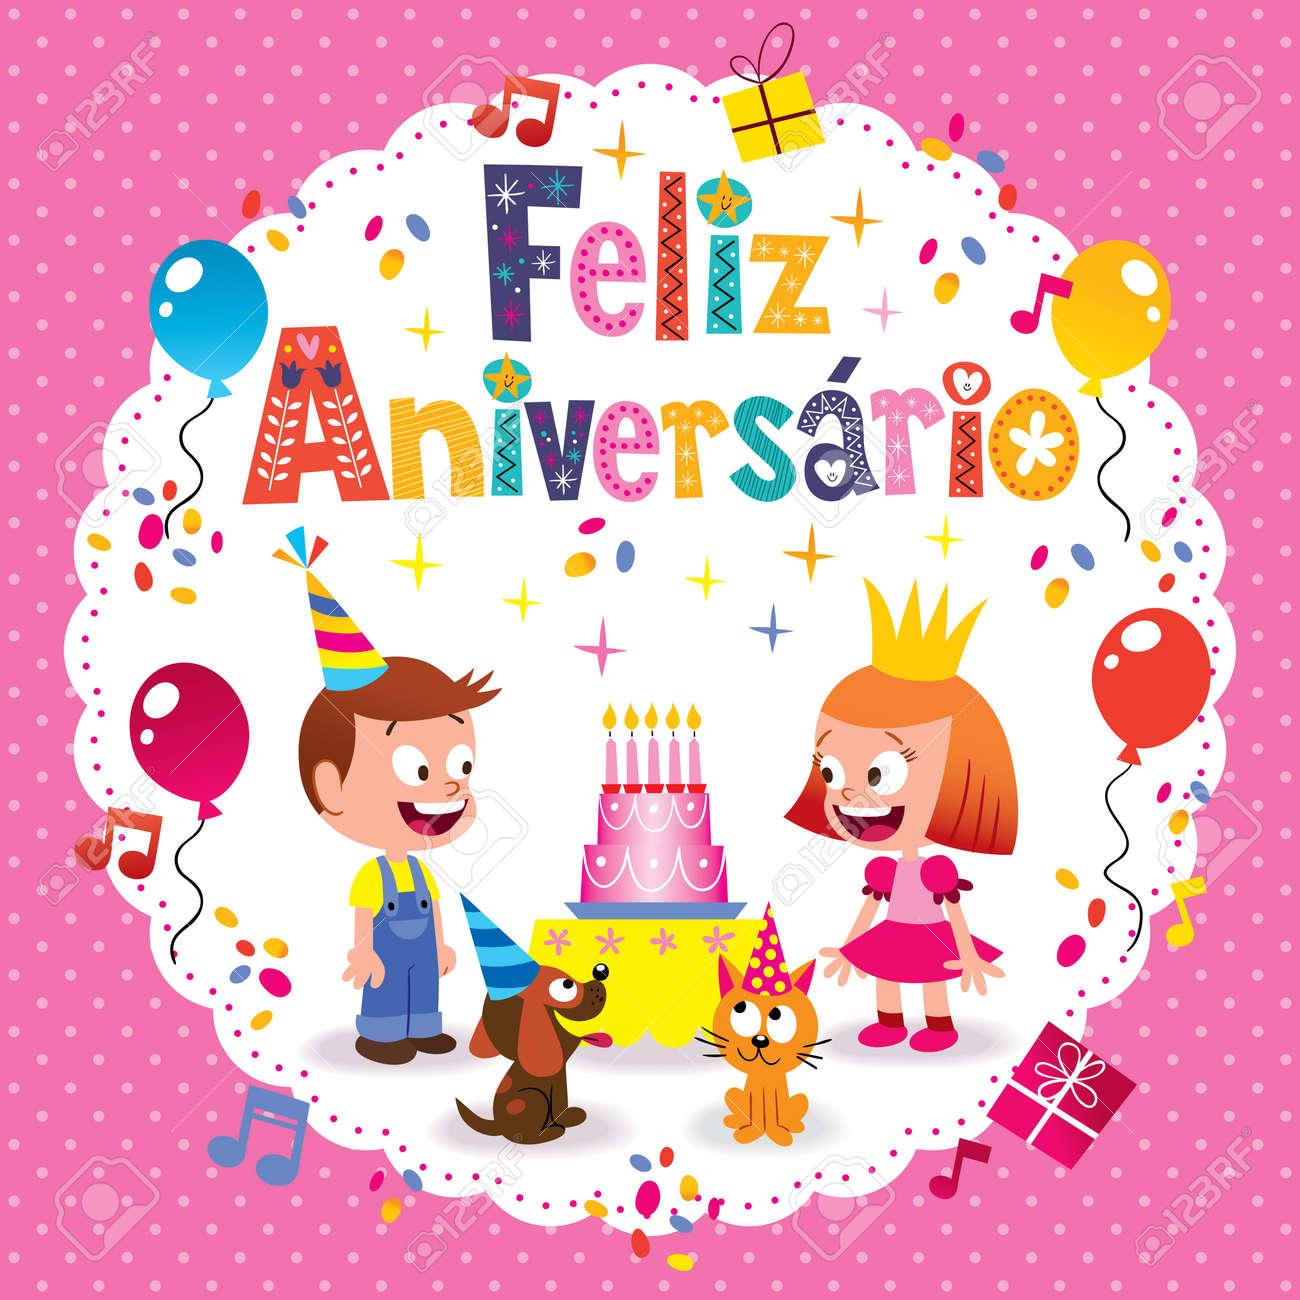 Feliz Aniversario Brazilian Portuguese Happy Birthday Kids Card Stock Vector